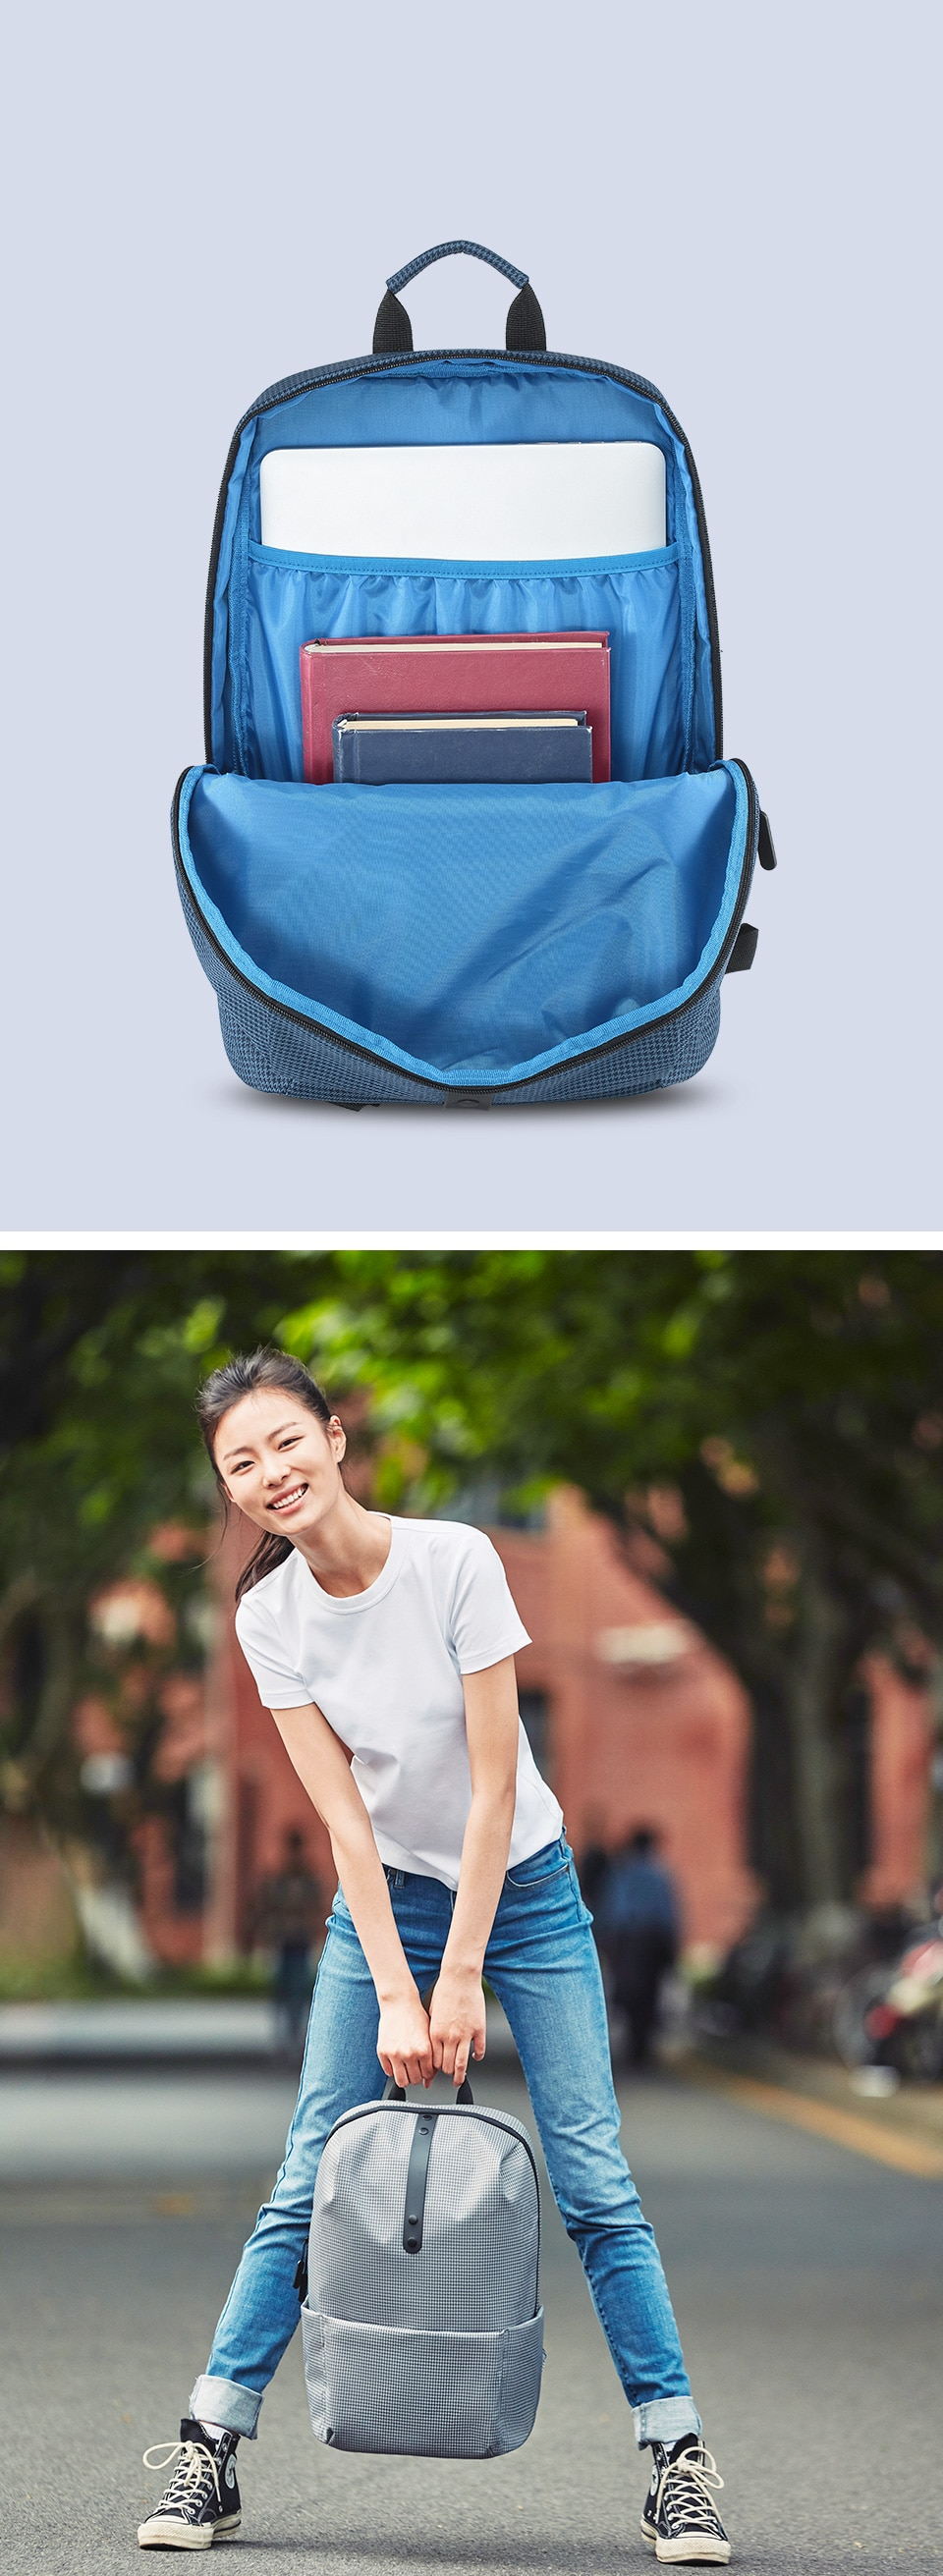 College Open Pocket Laptop Schoolbag Mochilas Backpack for girls and boys